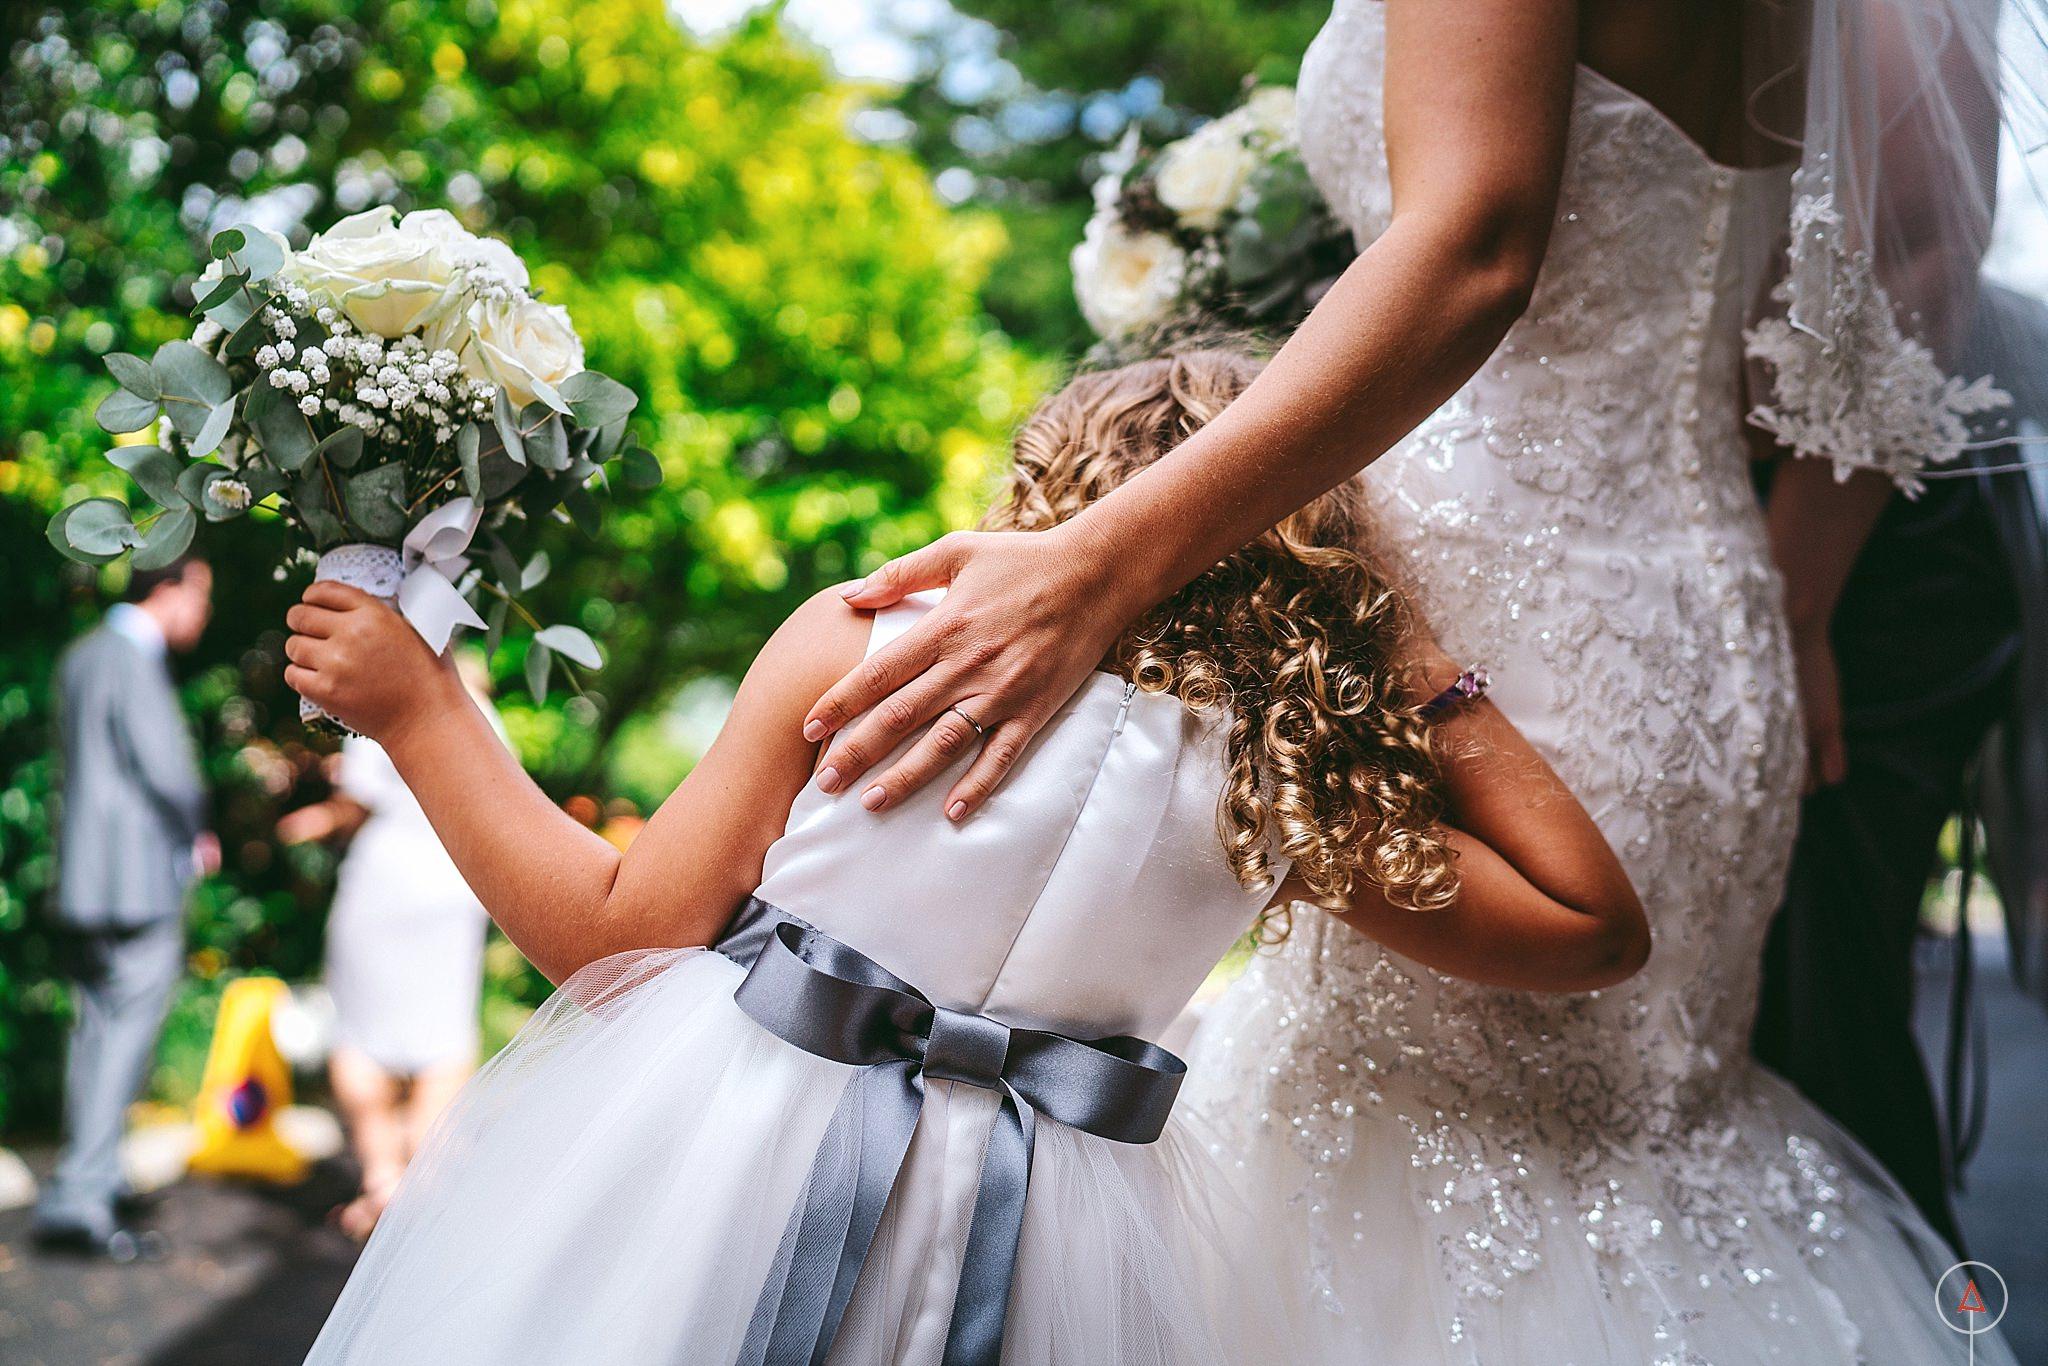 cardiff-wedding-photographer-aga-tomaszek_0373